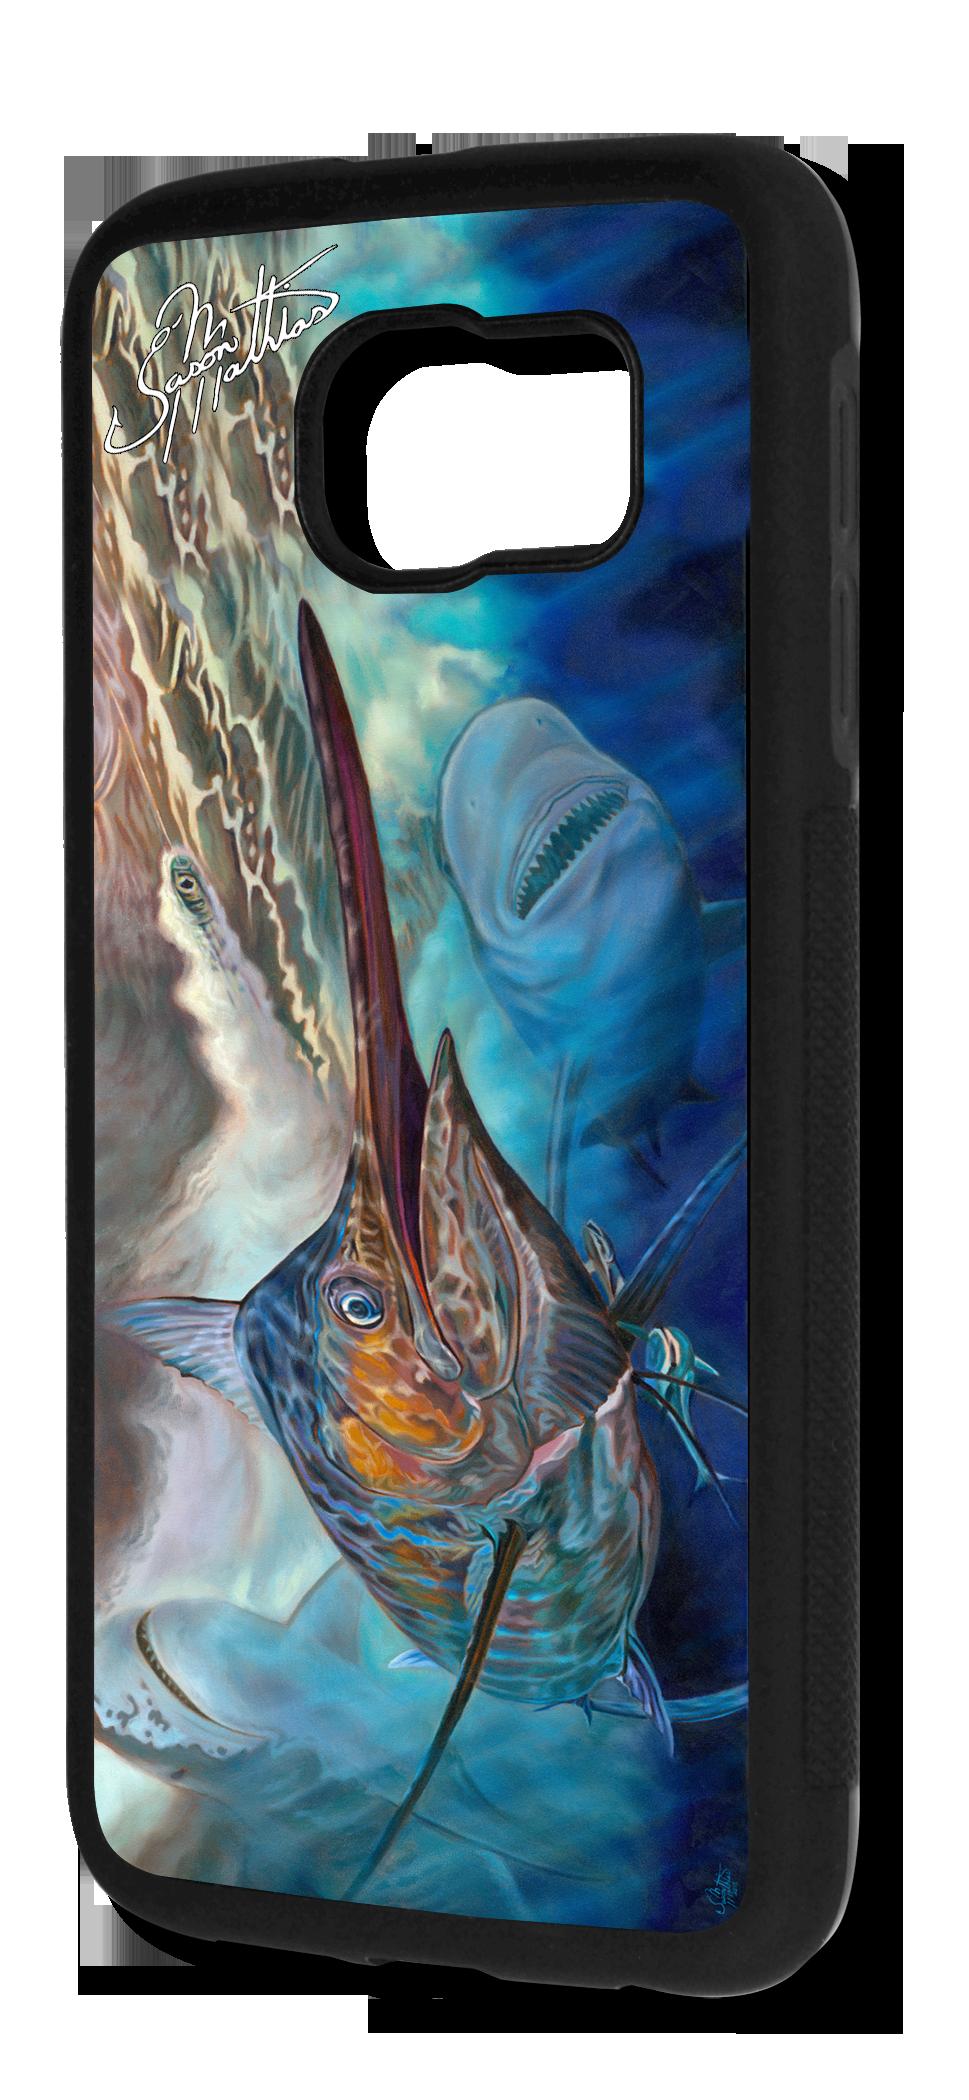 samsung-galaxy-s6-case-marlin-shark-art-jason-mathias.png